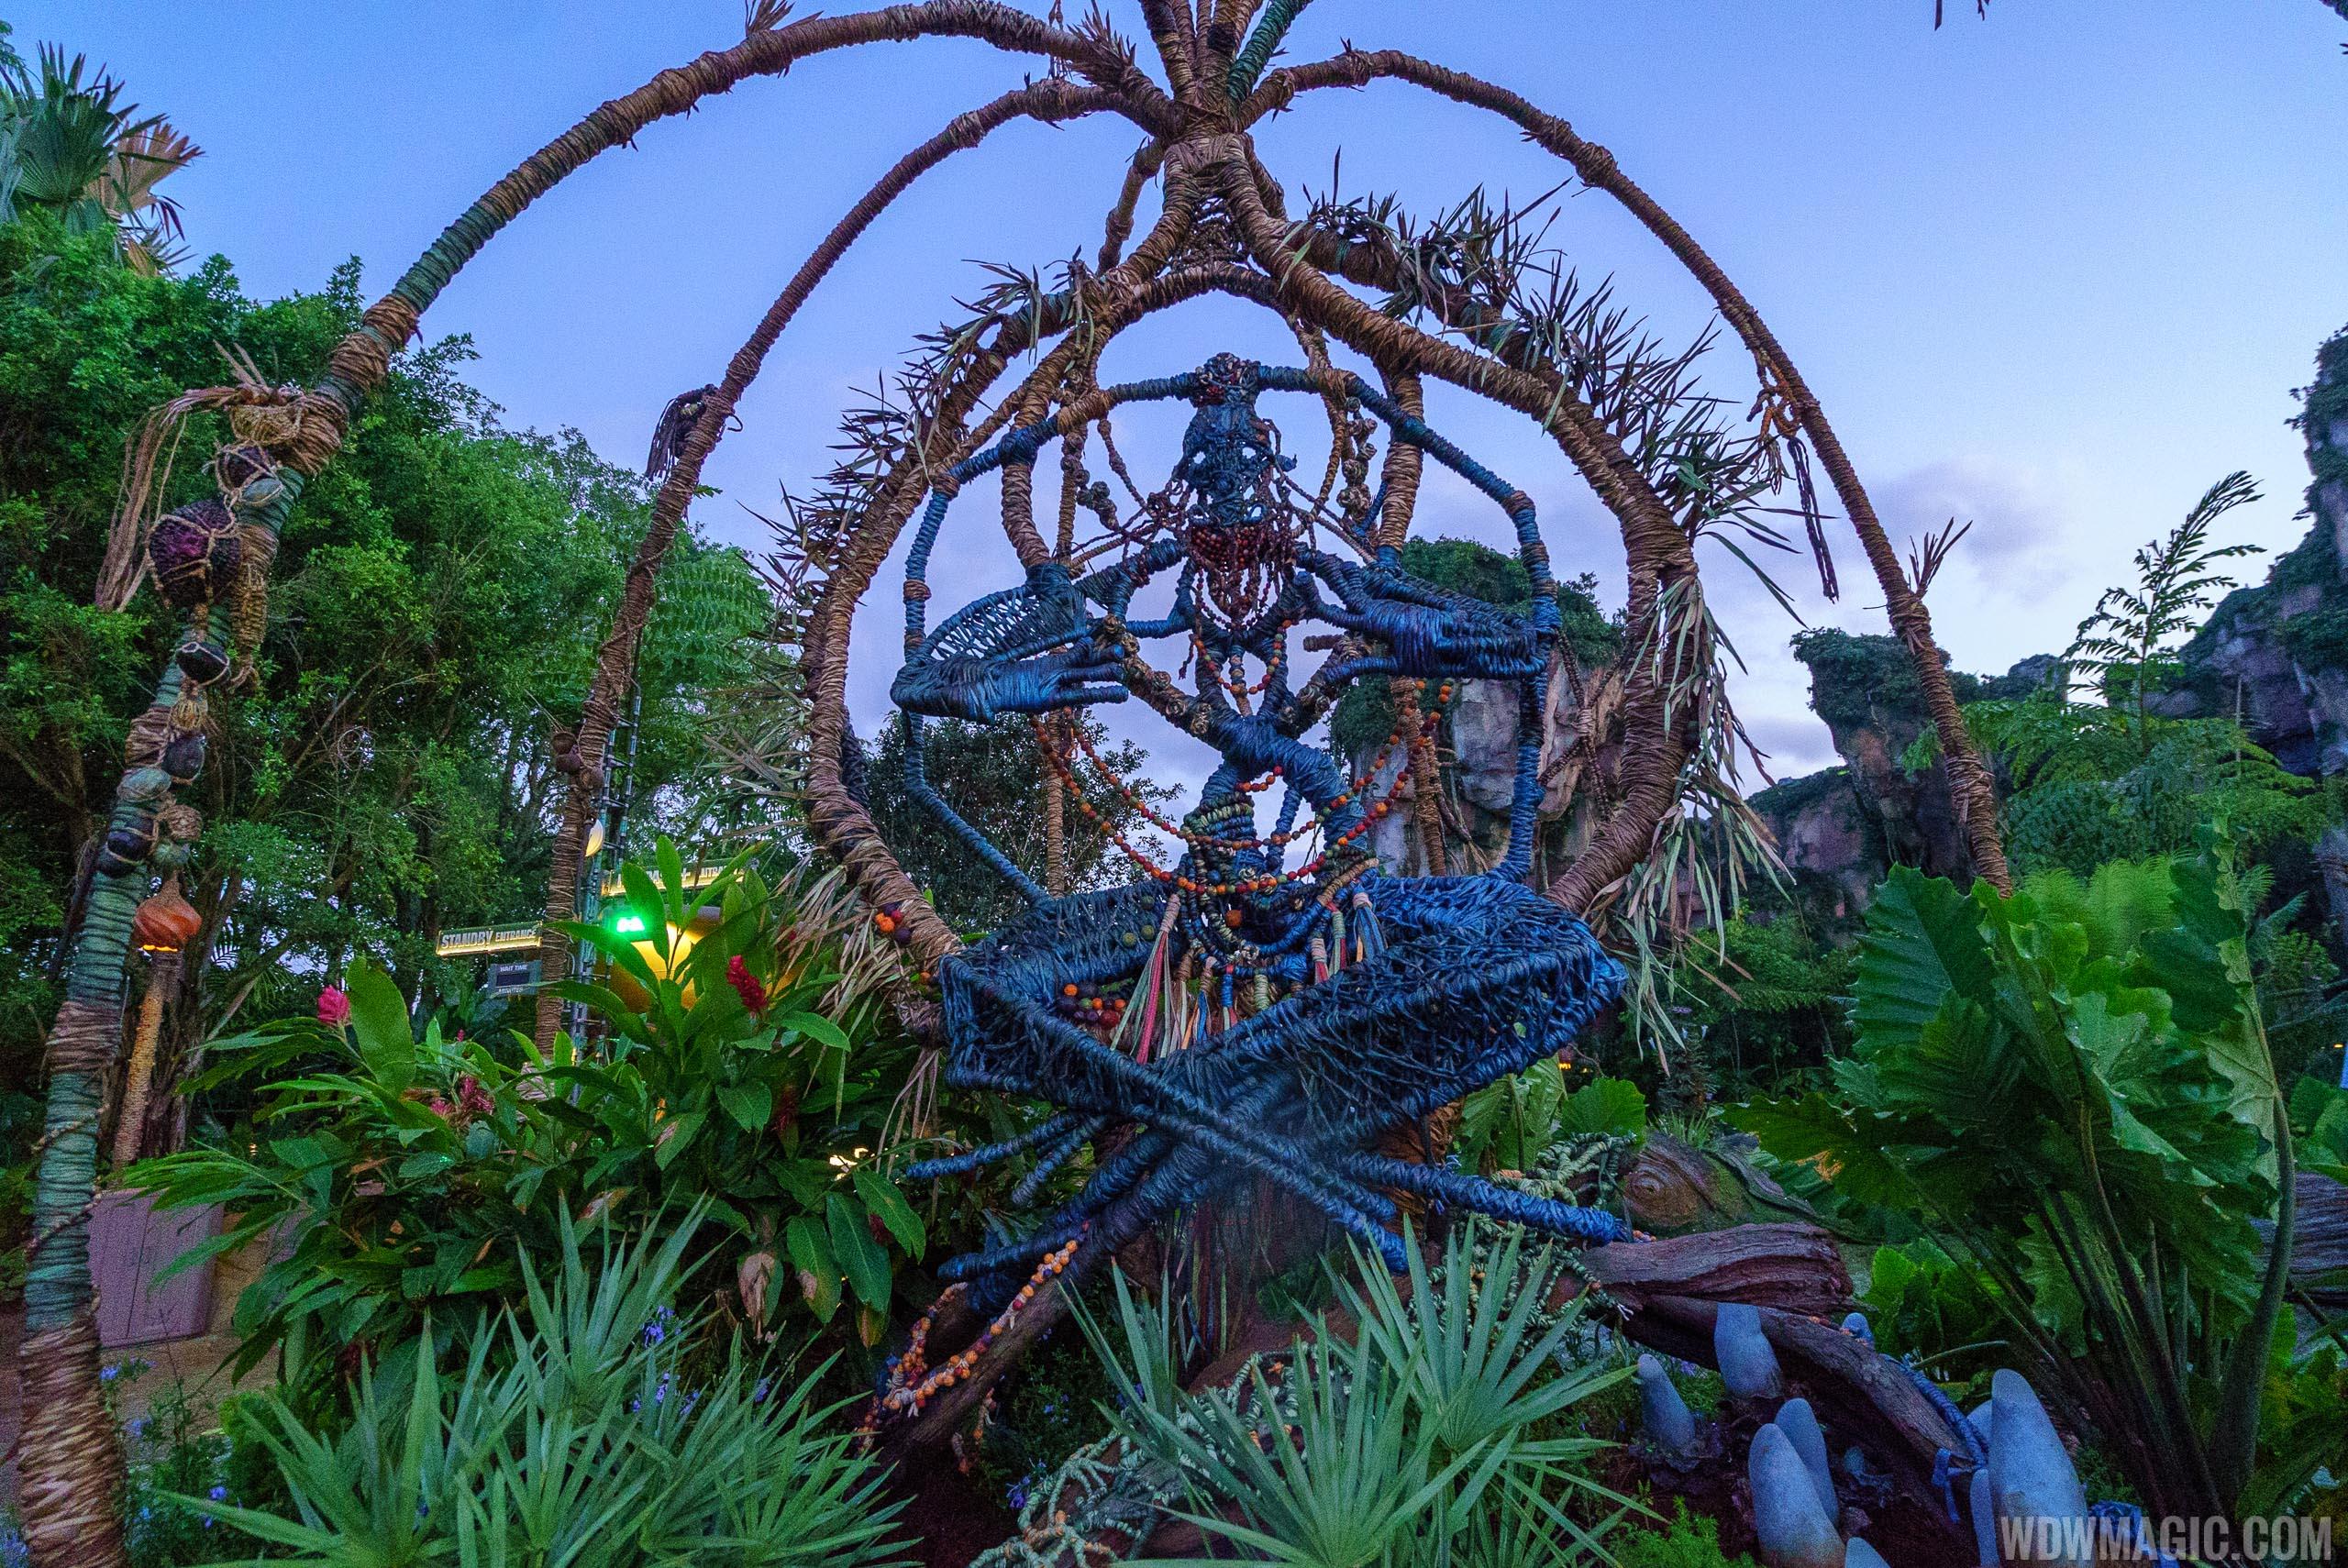 The Landscape of Pandora - The World of Avatar